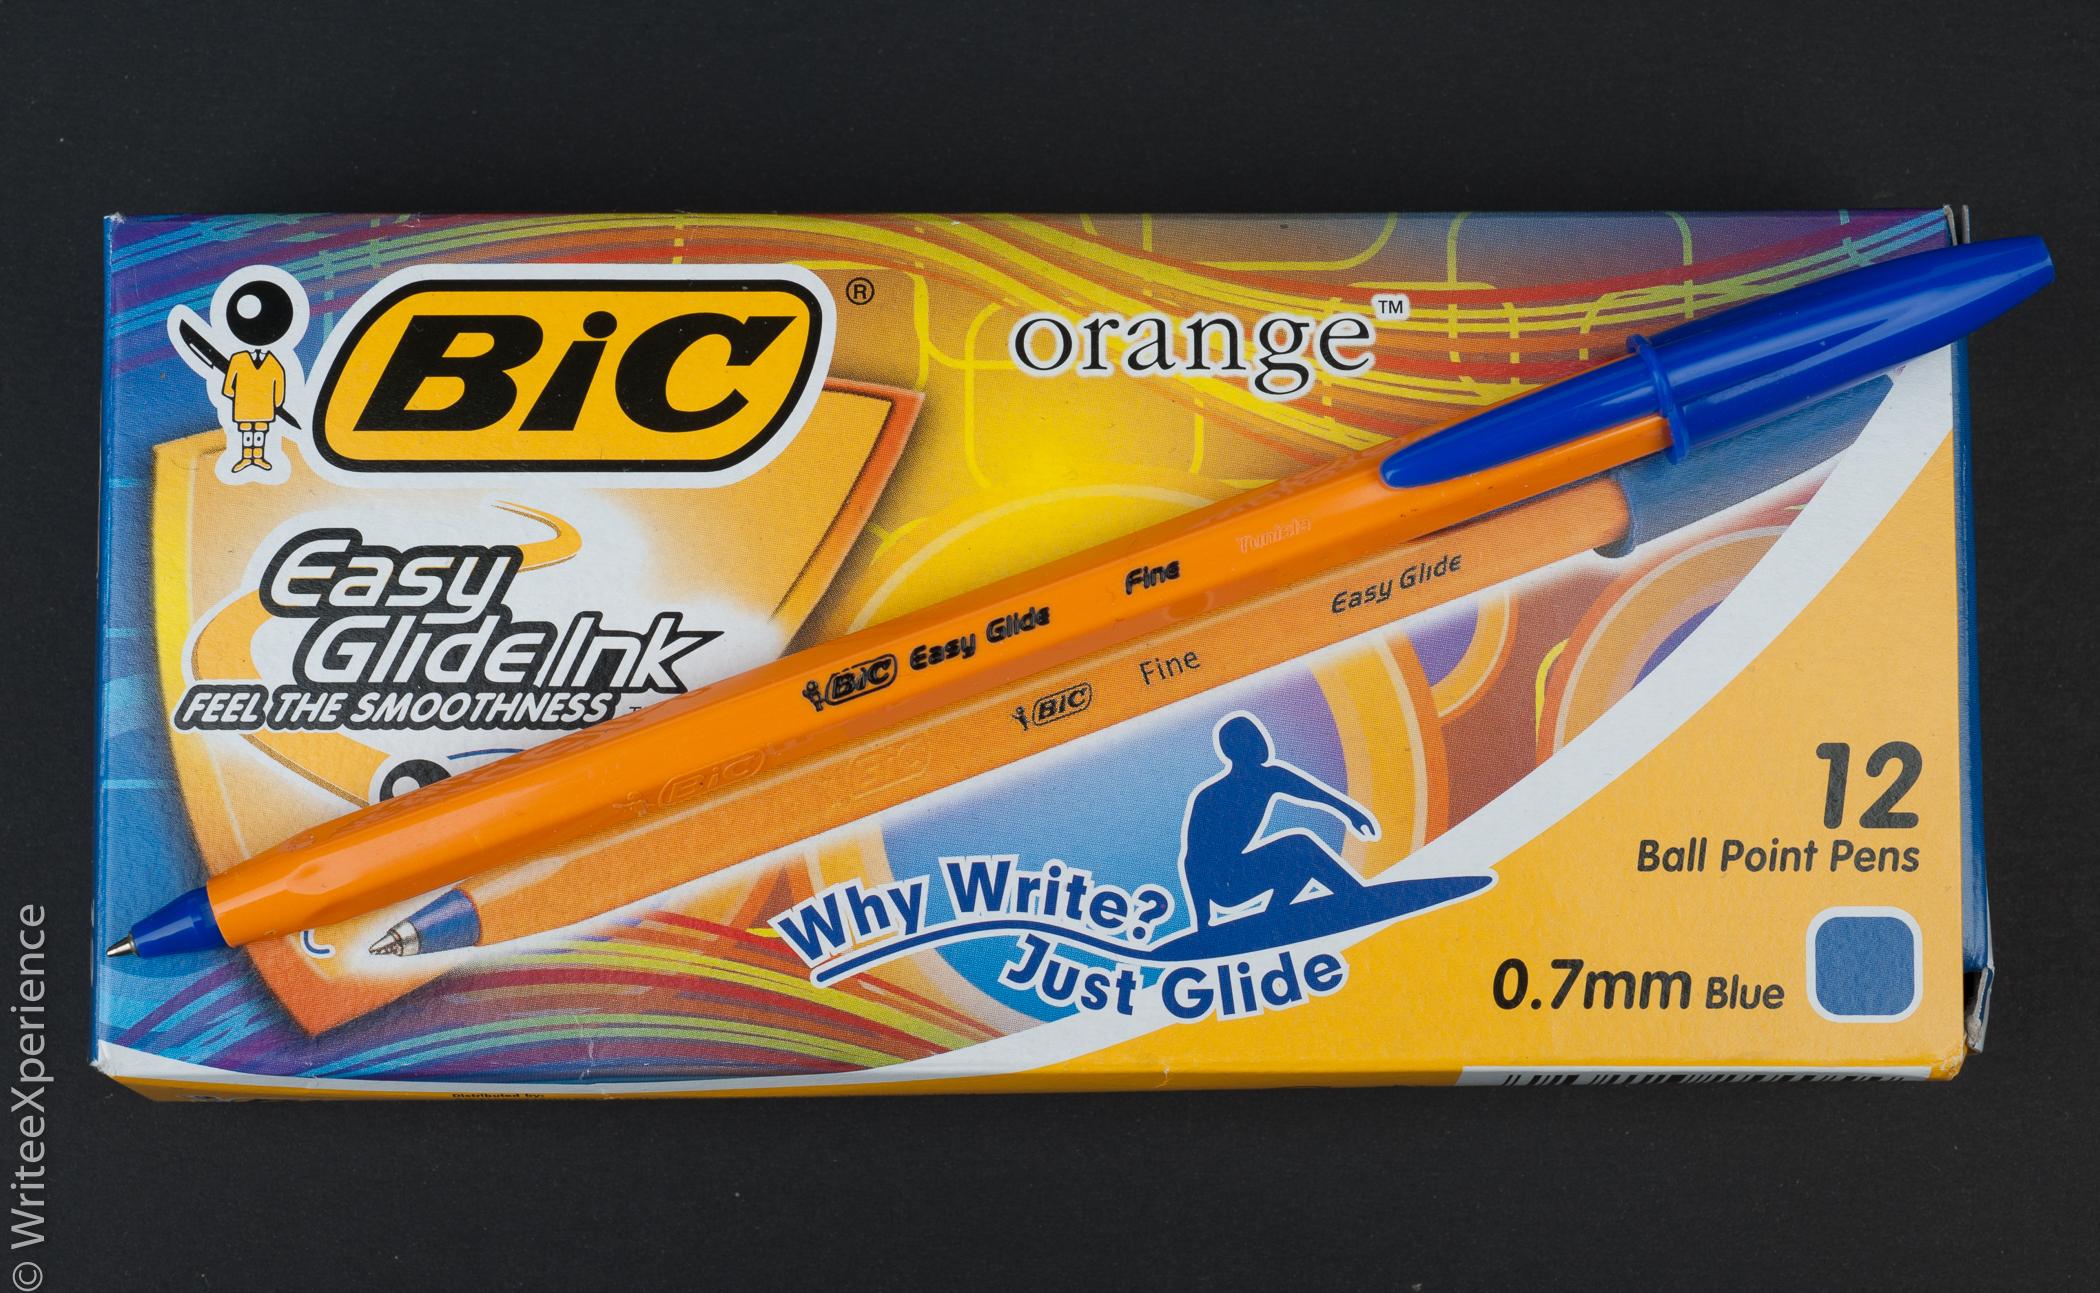 WriteeXperience-Bic_Orange_Cristal-1.jpg